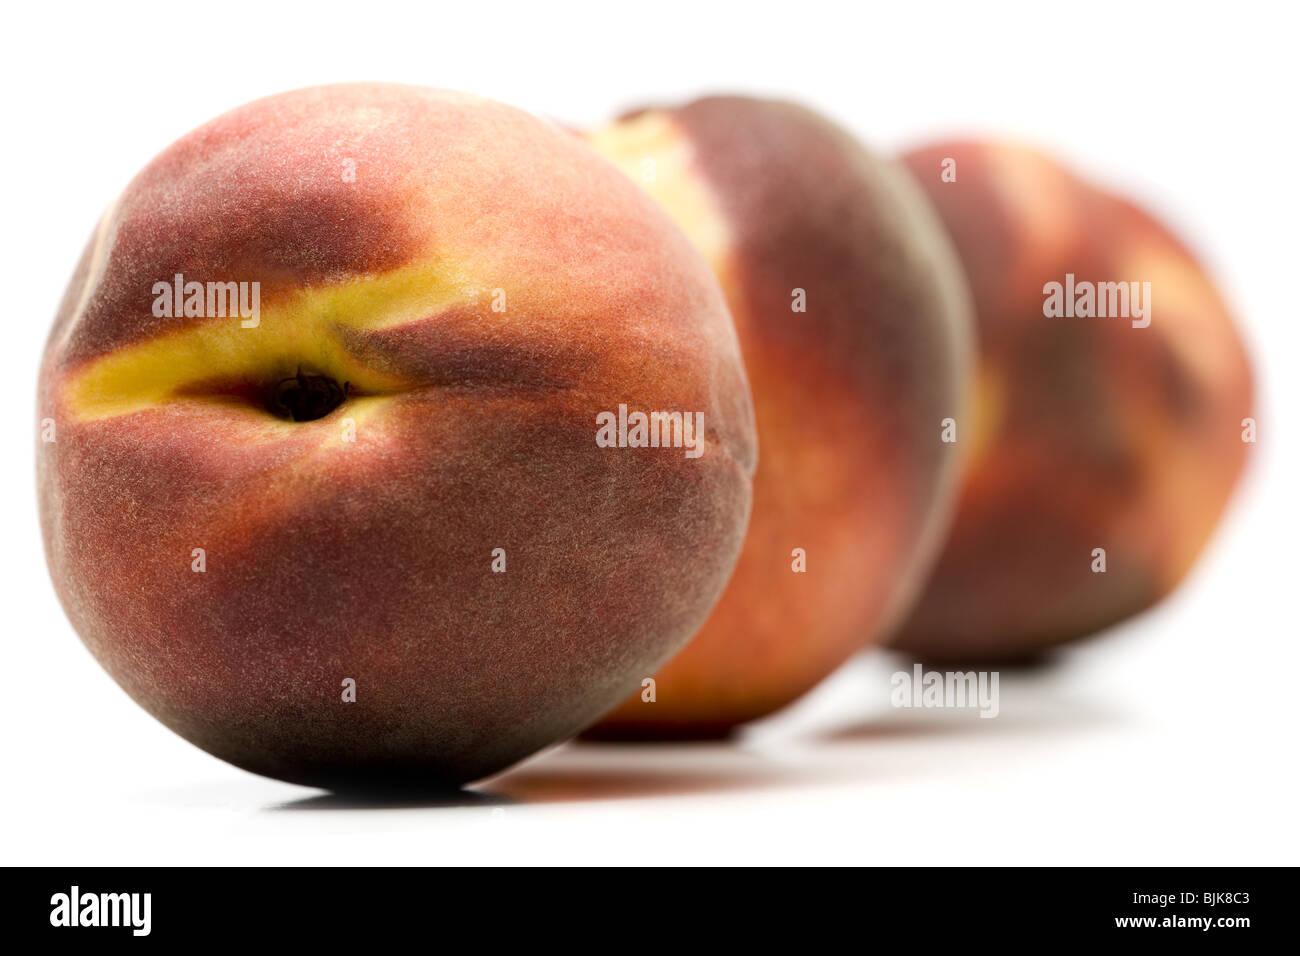 Three peaches - Stock Image